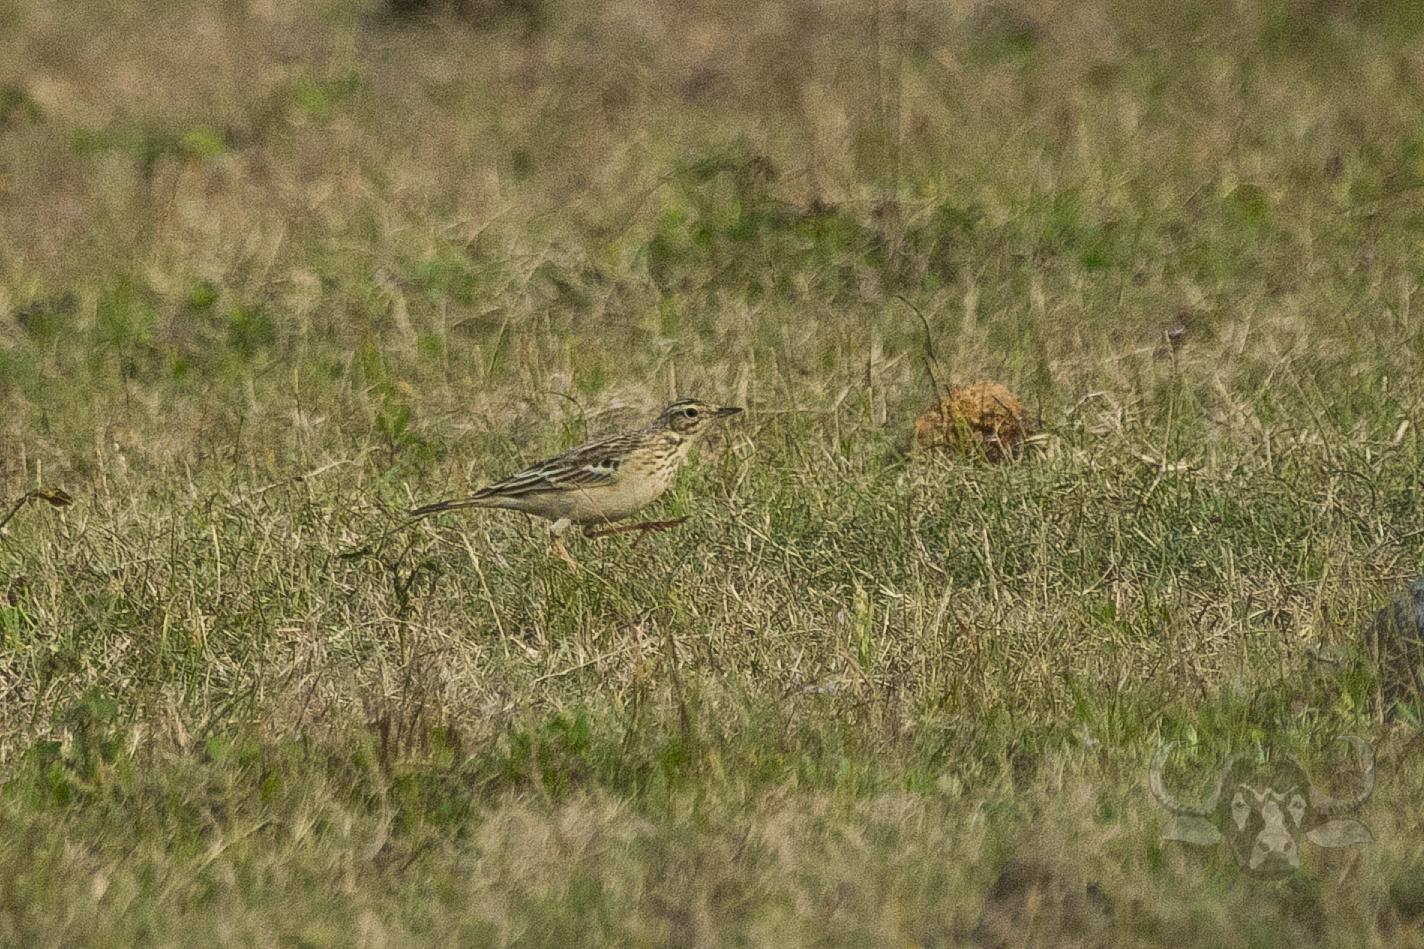 kulu-camp-birds-jan17-sr-wm-12